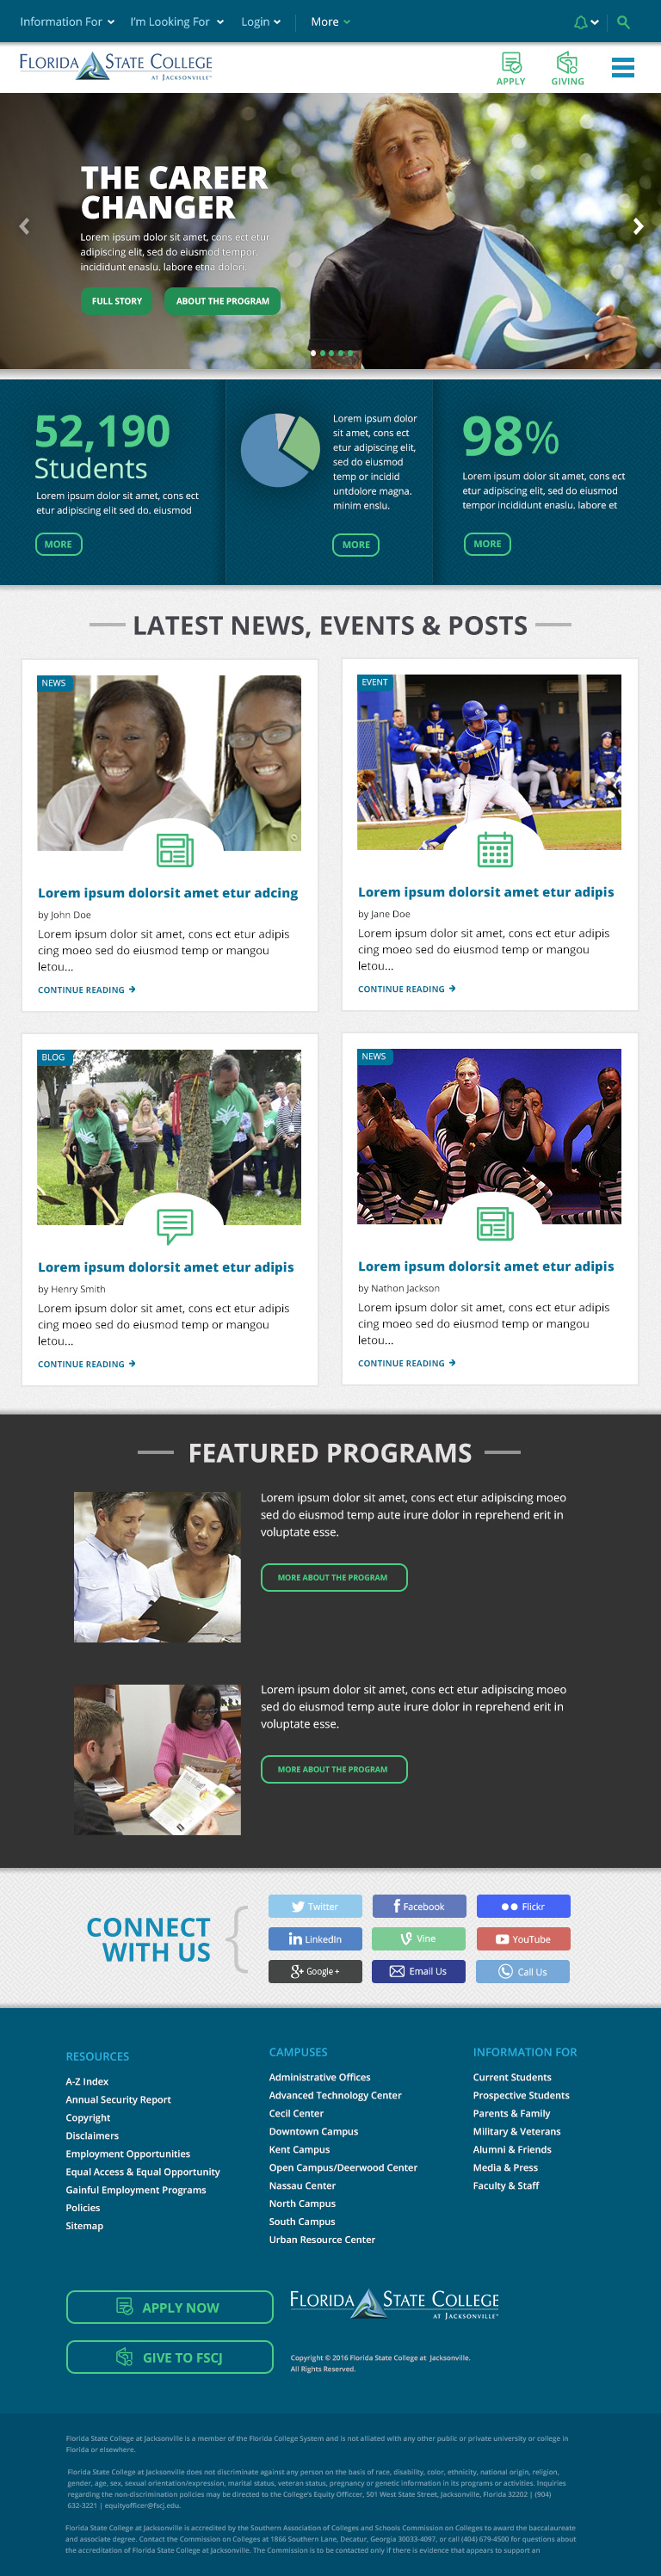 Florida State College Website – Tablet